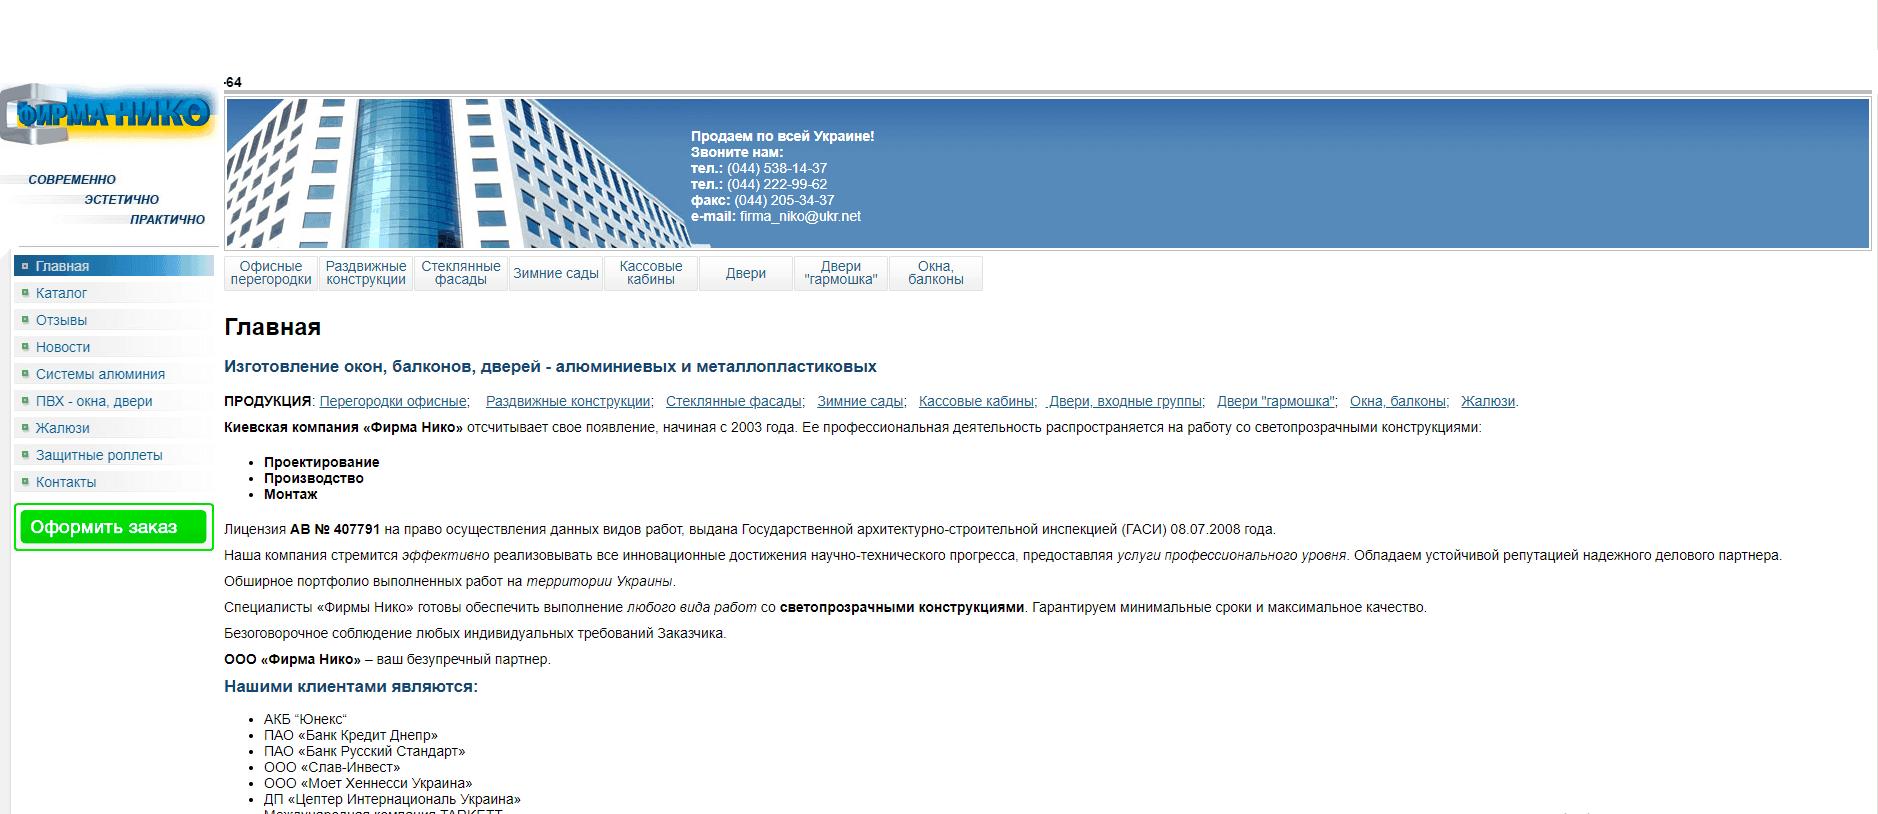 Старый сайт фирма нико